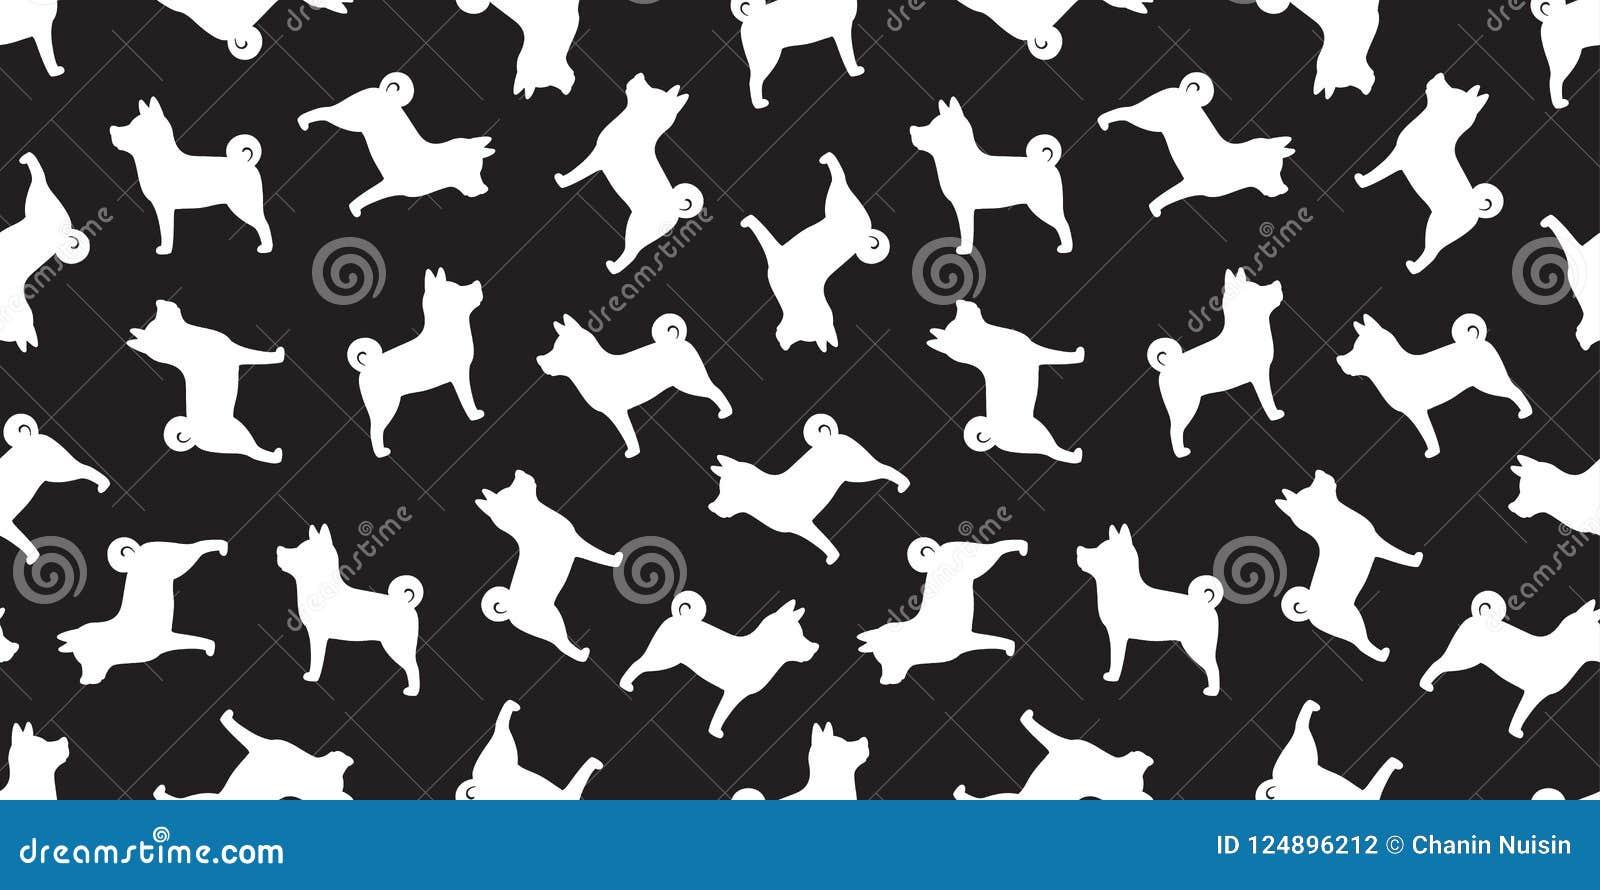 Dog Seamless French Bulldog Vector Pattern Isolated Wallpaper Doodle Background Cartoon Black Stock Illustration Illustration Of Bone Labrador 124896212